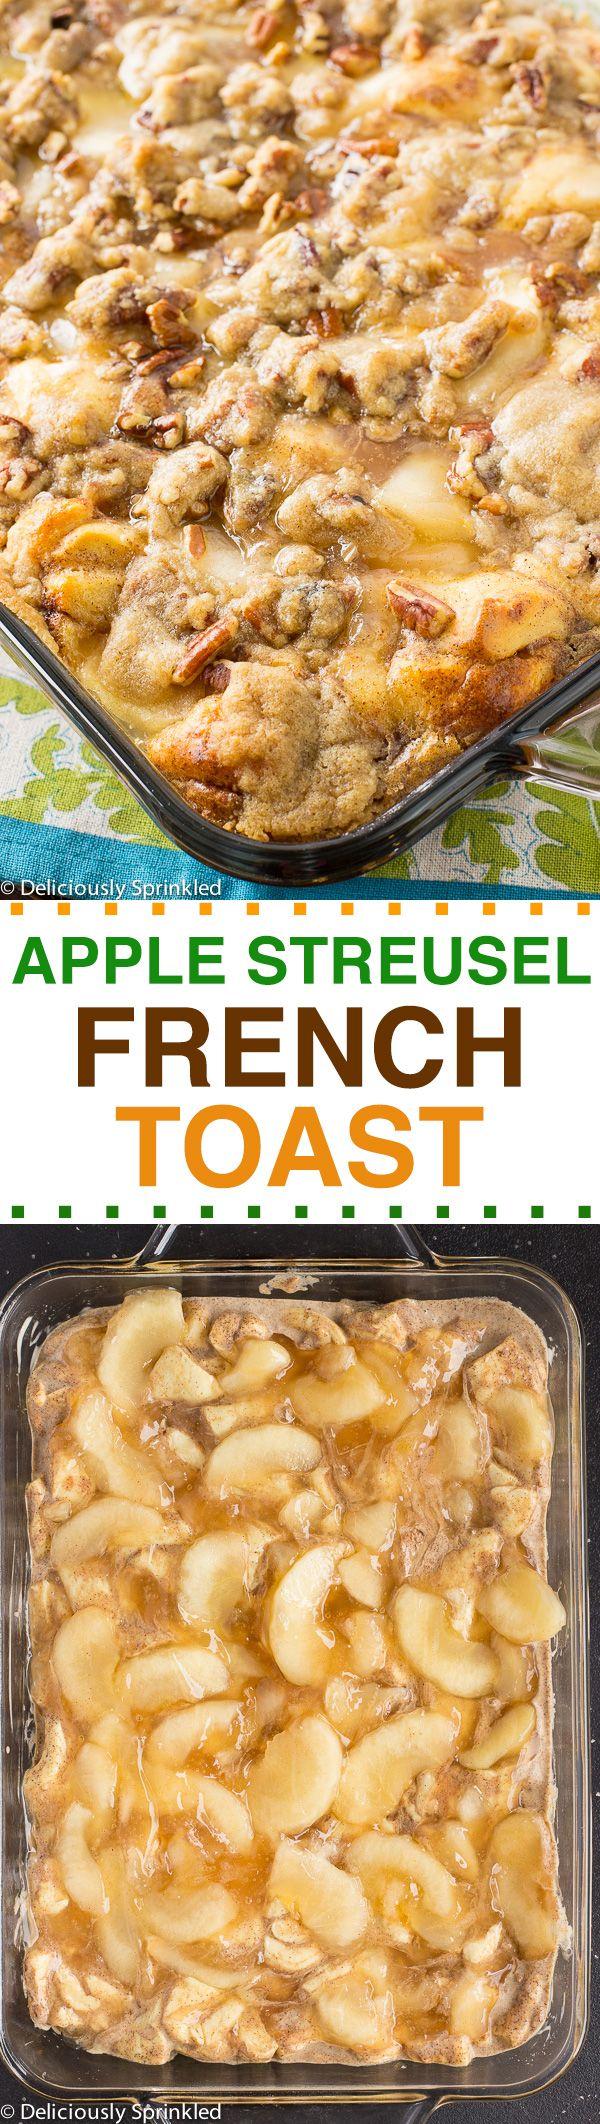 Apple Streusel French Toast Bake